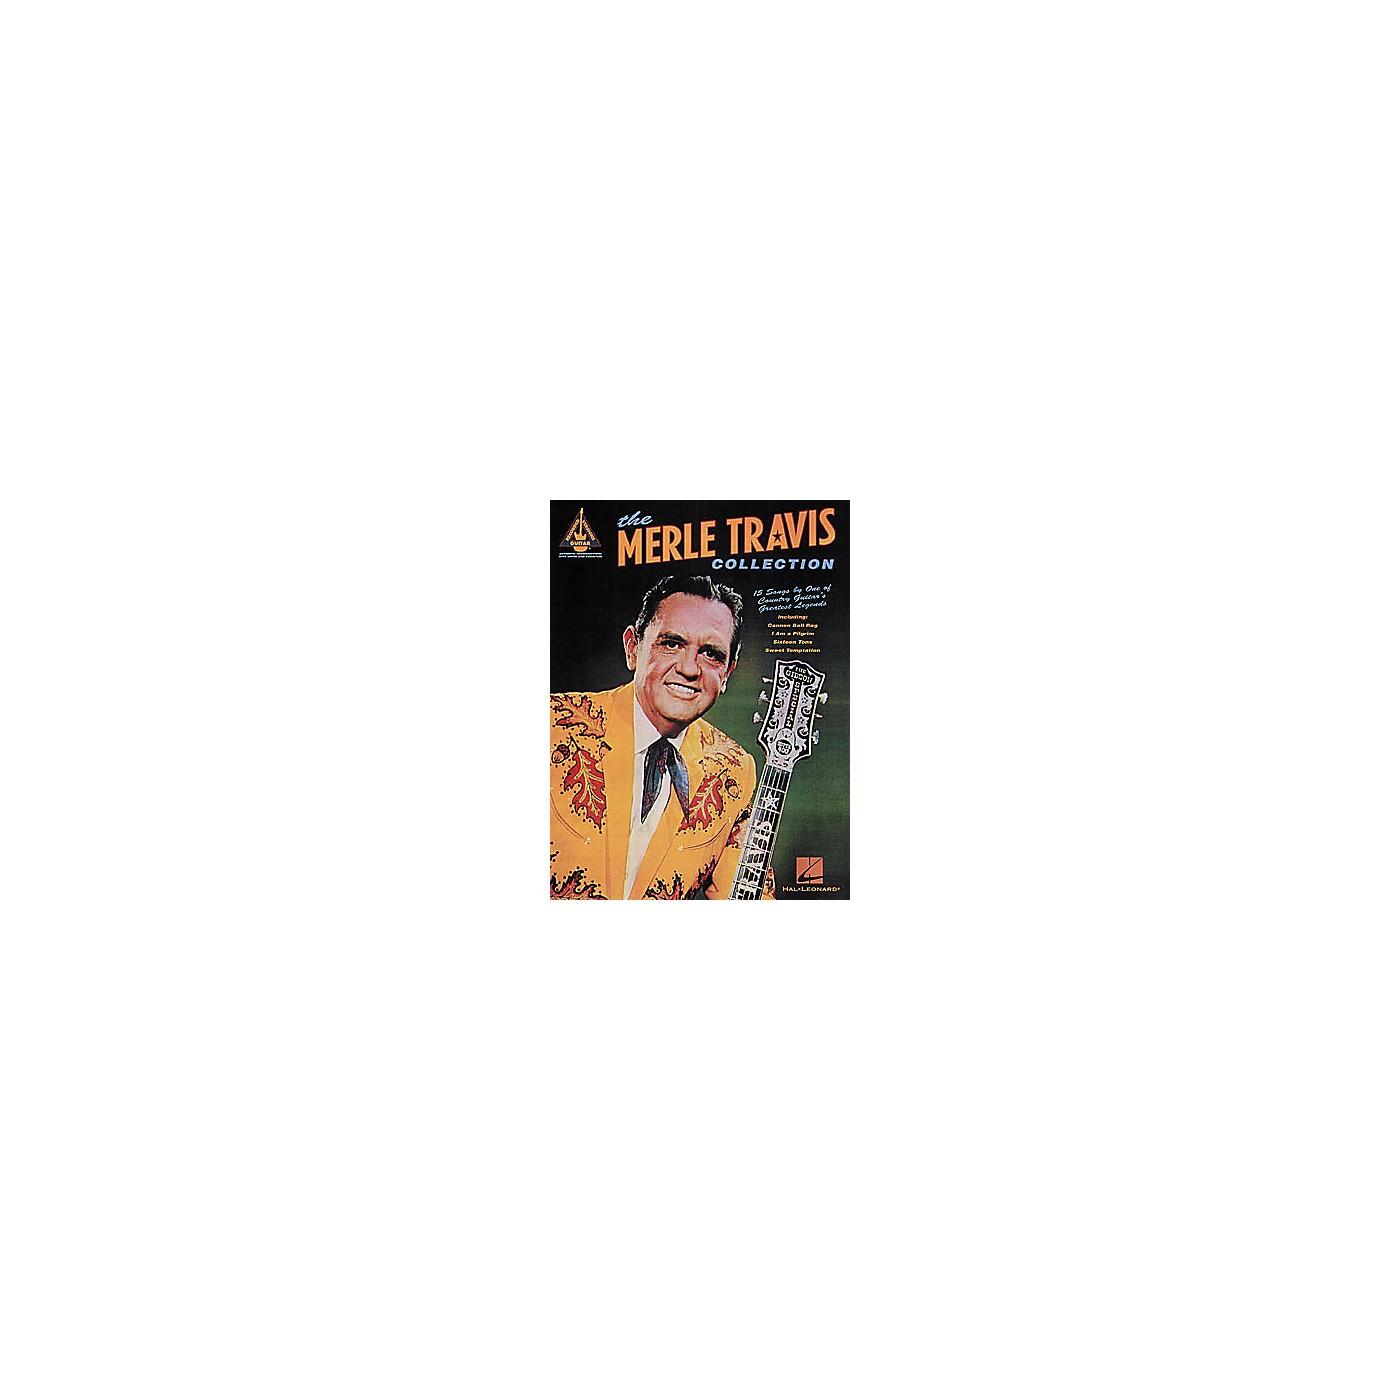 Hal Leonard The Merle Travis Collection Guitar Tab Book thumbnail